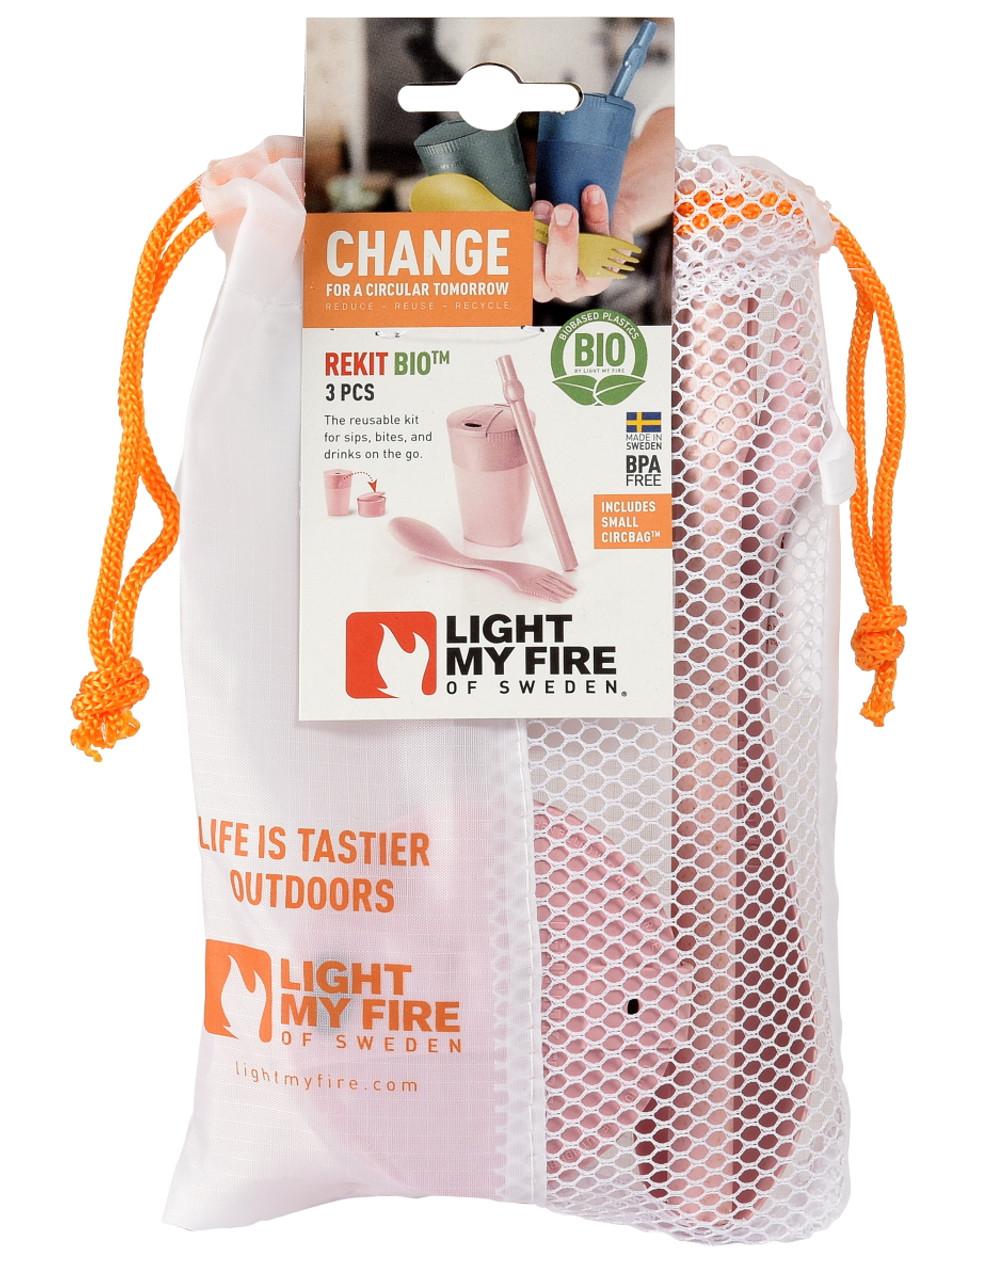 Light My Fire ReKit Bio (Collapsible Cup, Spork, Straw)